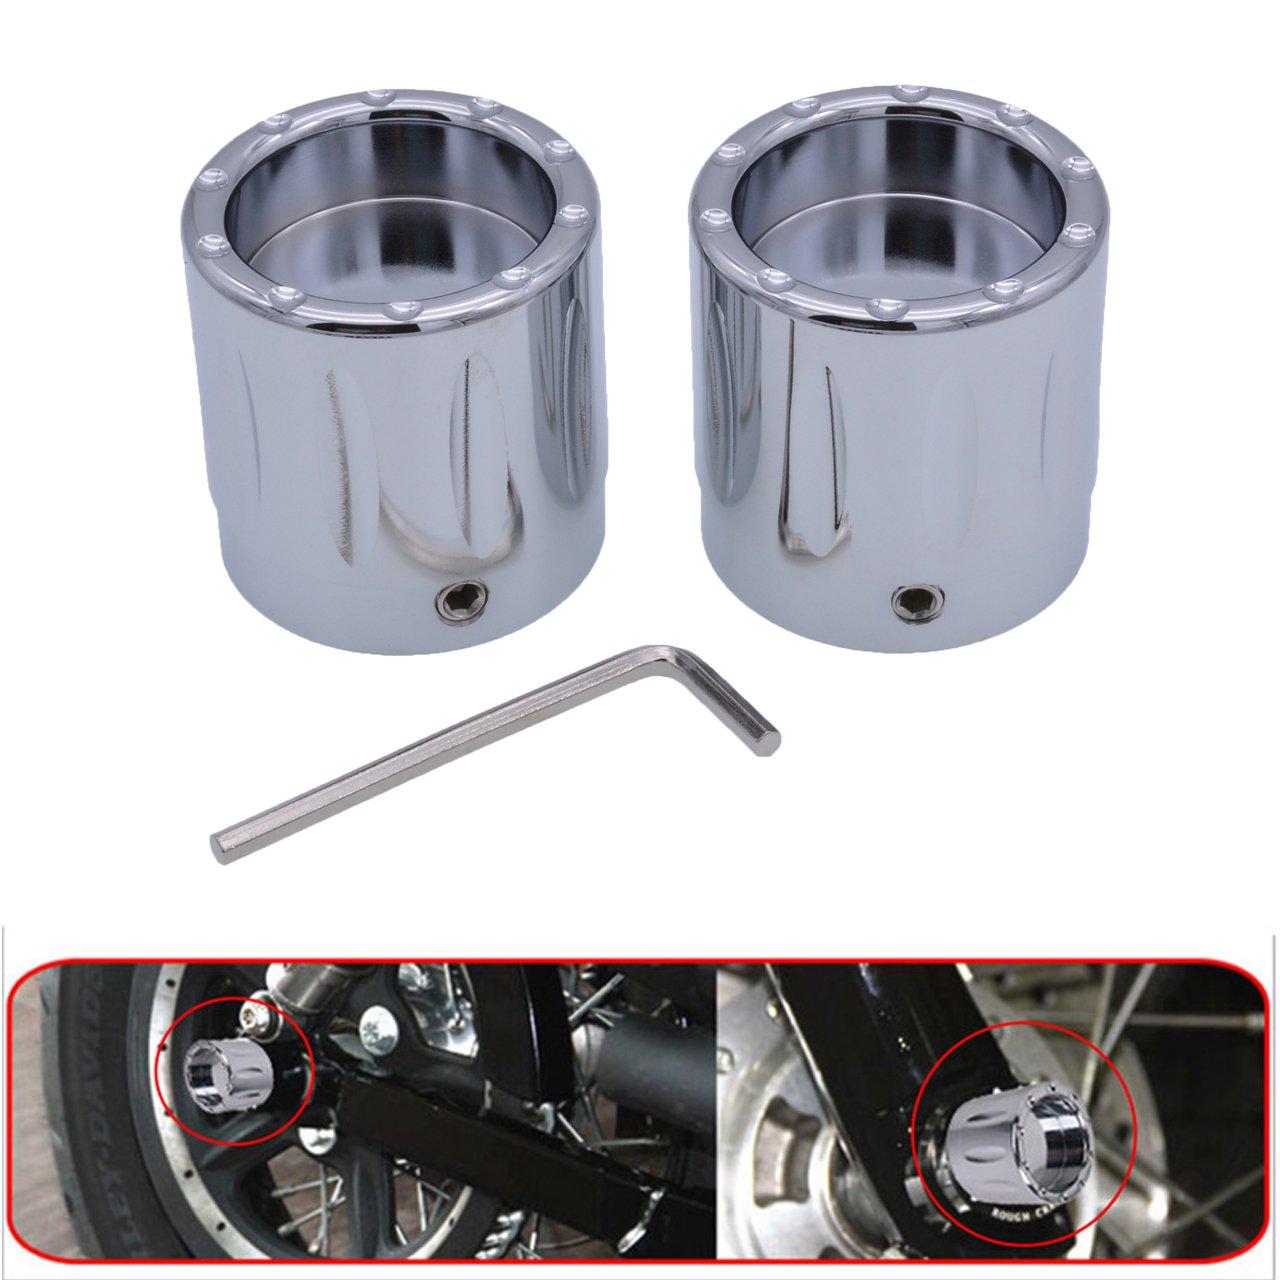 KaTur Negro CNC Deep Edge Contraste Corte Tapa Tuerca del Eje Delantero para Harley Dyna V-Rod Touring Sportster XL883 XL1200 –  Set